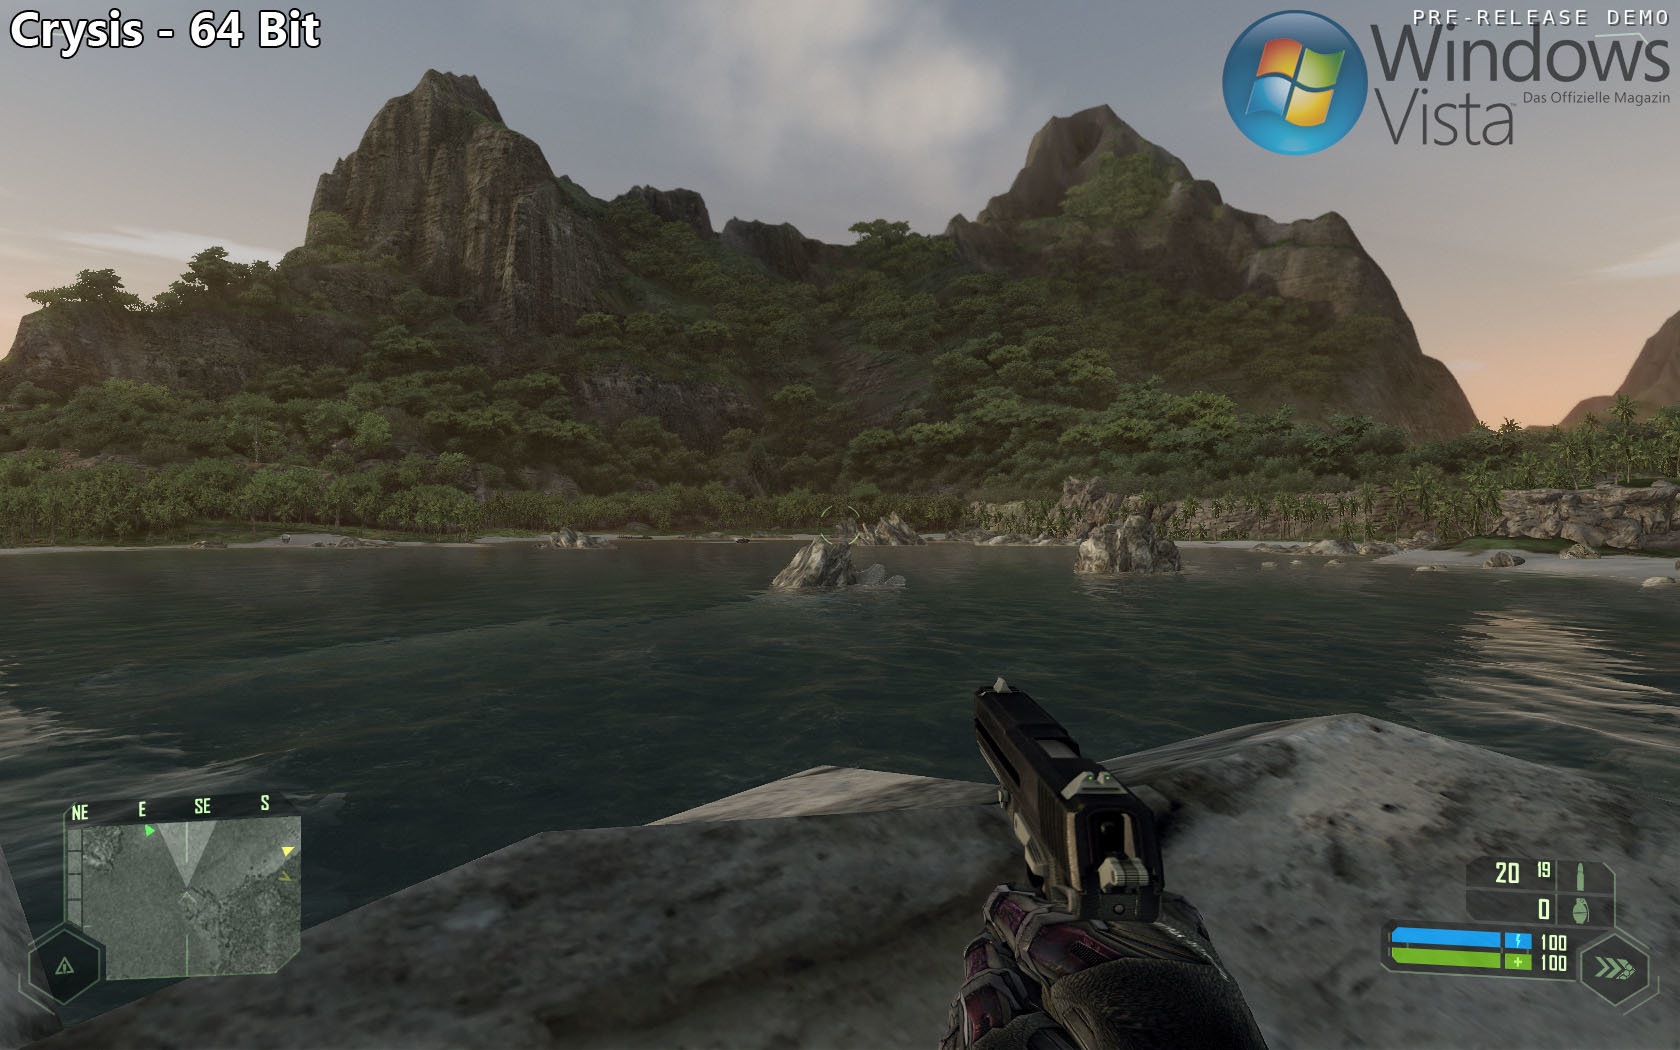 Crysis - Berglandschaft (64 Bit)